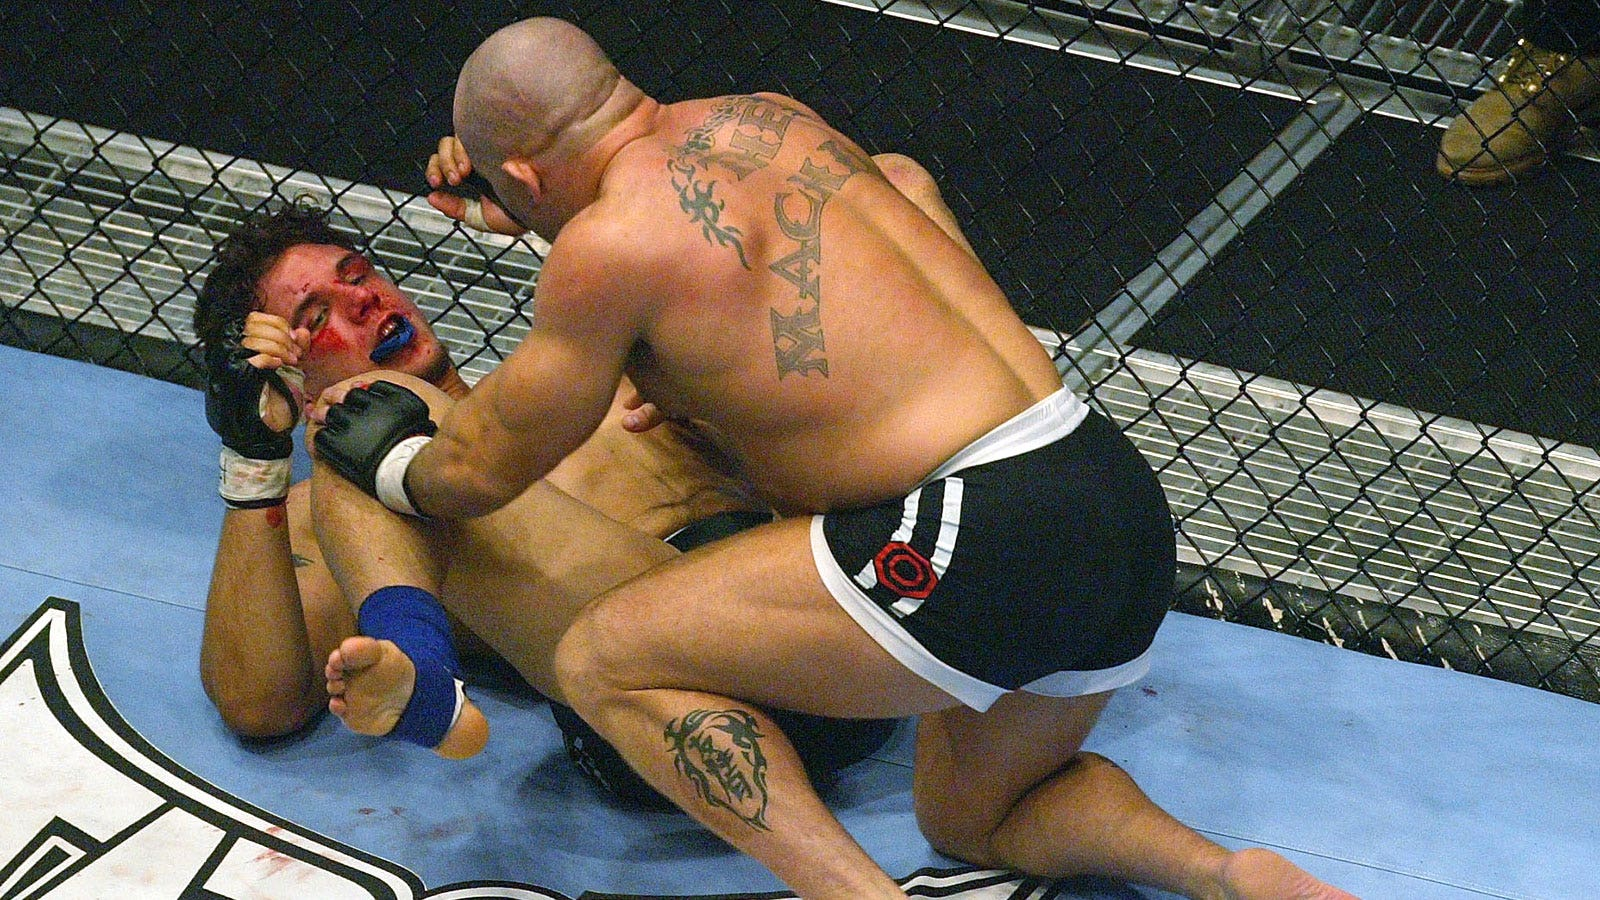 022516-UFC-Ian-Freeman-pi-ssm.jpg